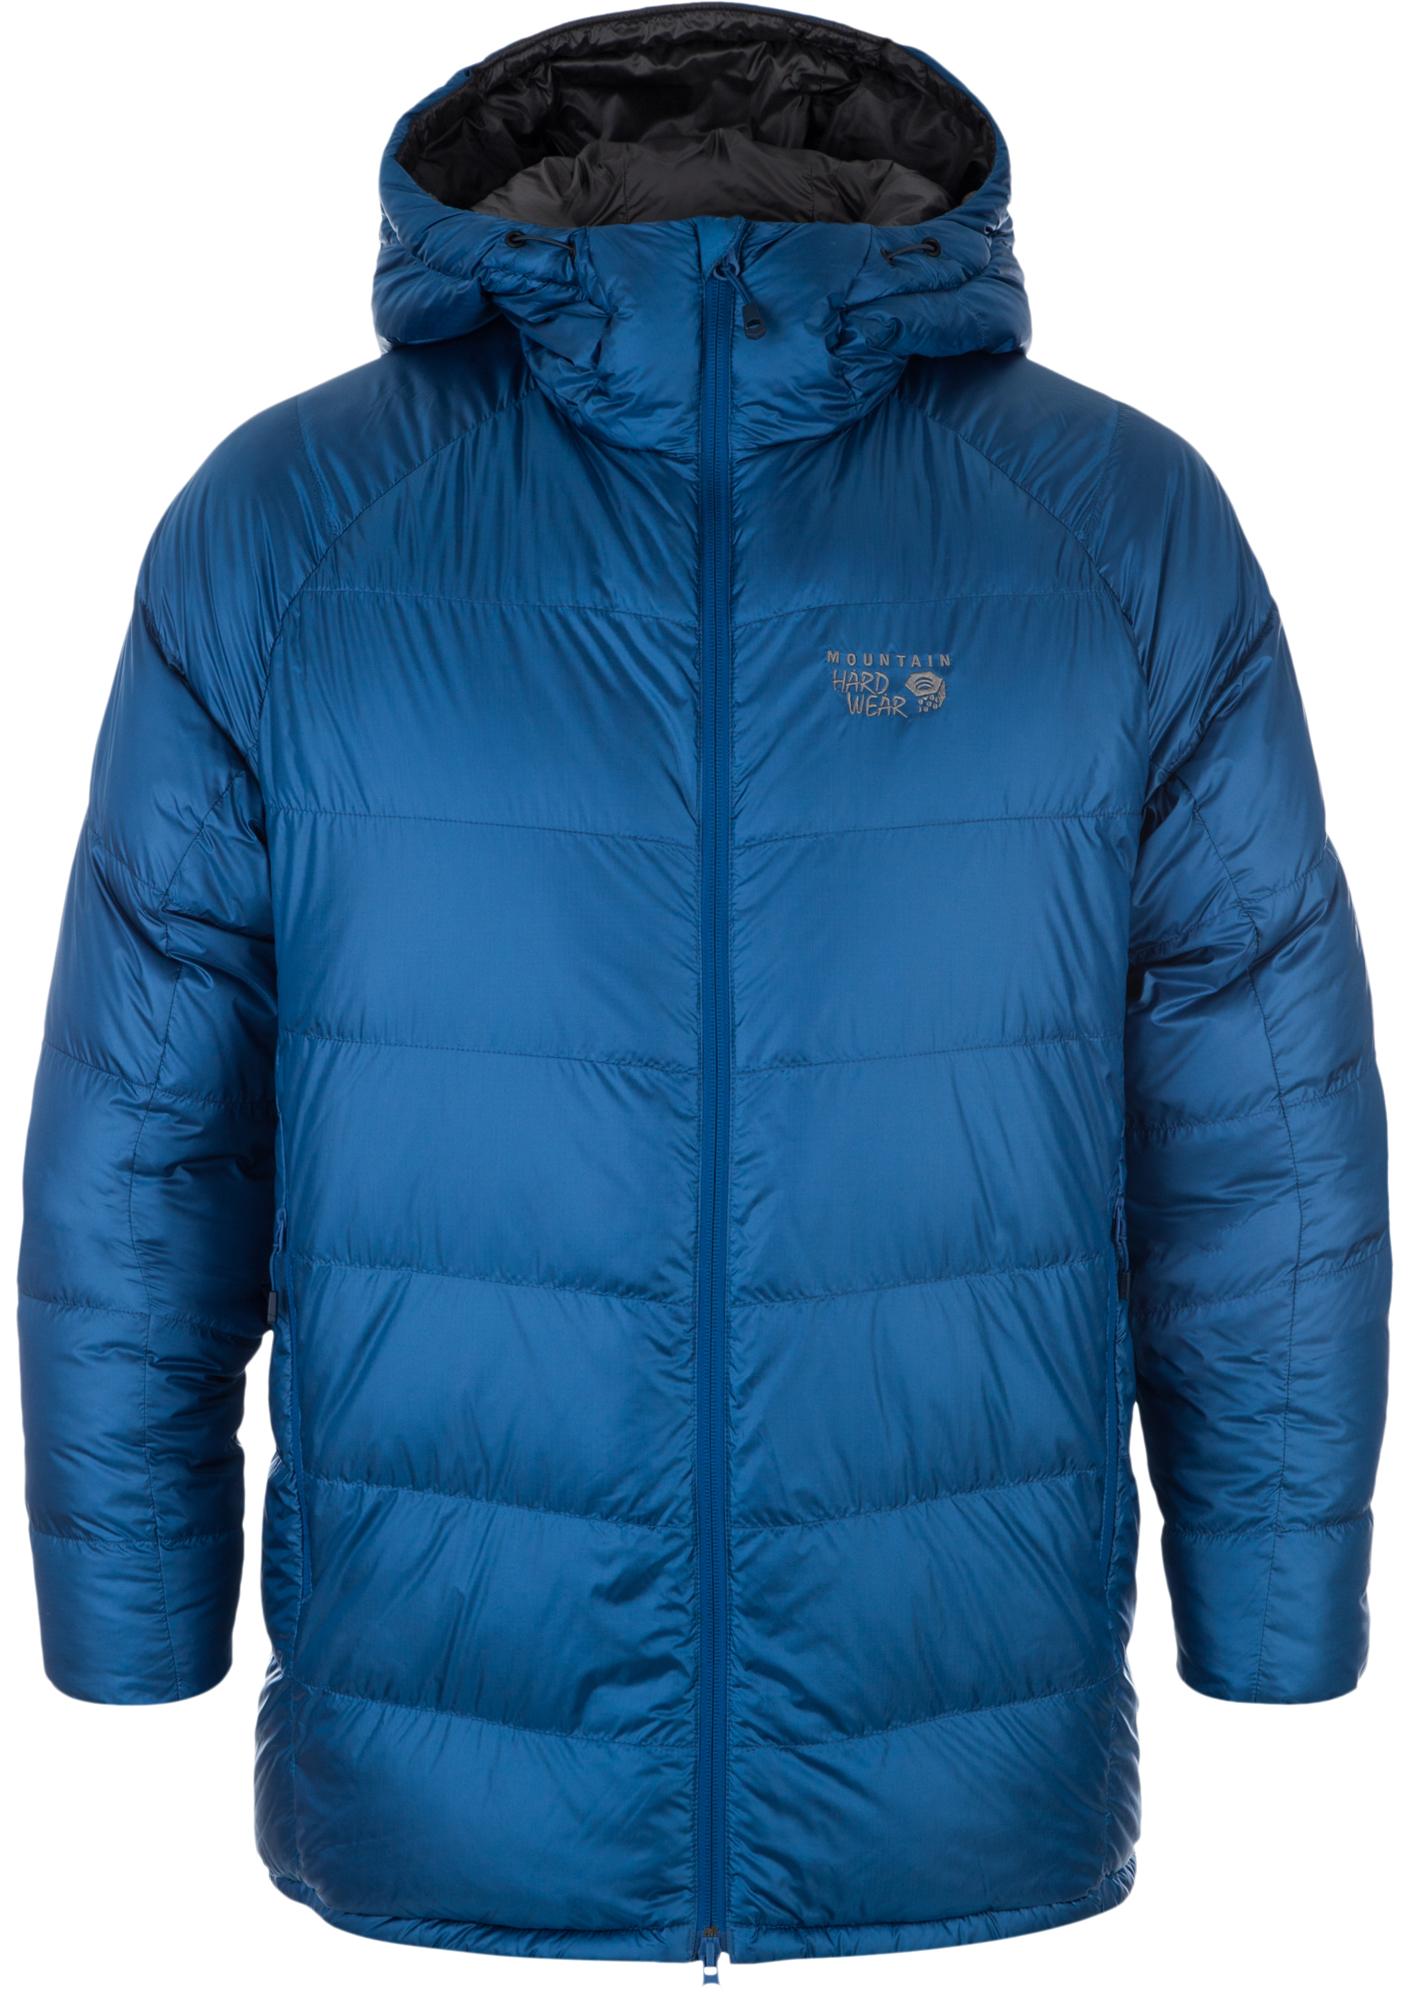 Mountain Hardwear Куртка пуховая мужская Mountain Hardwear Phantom, размер 54